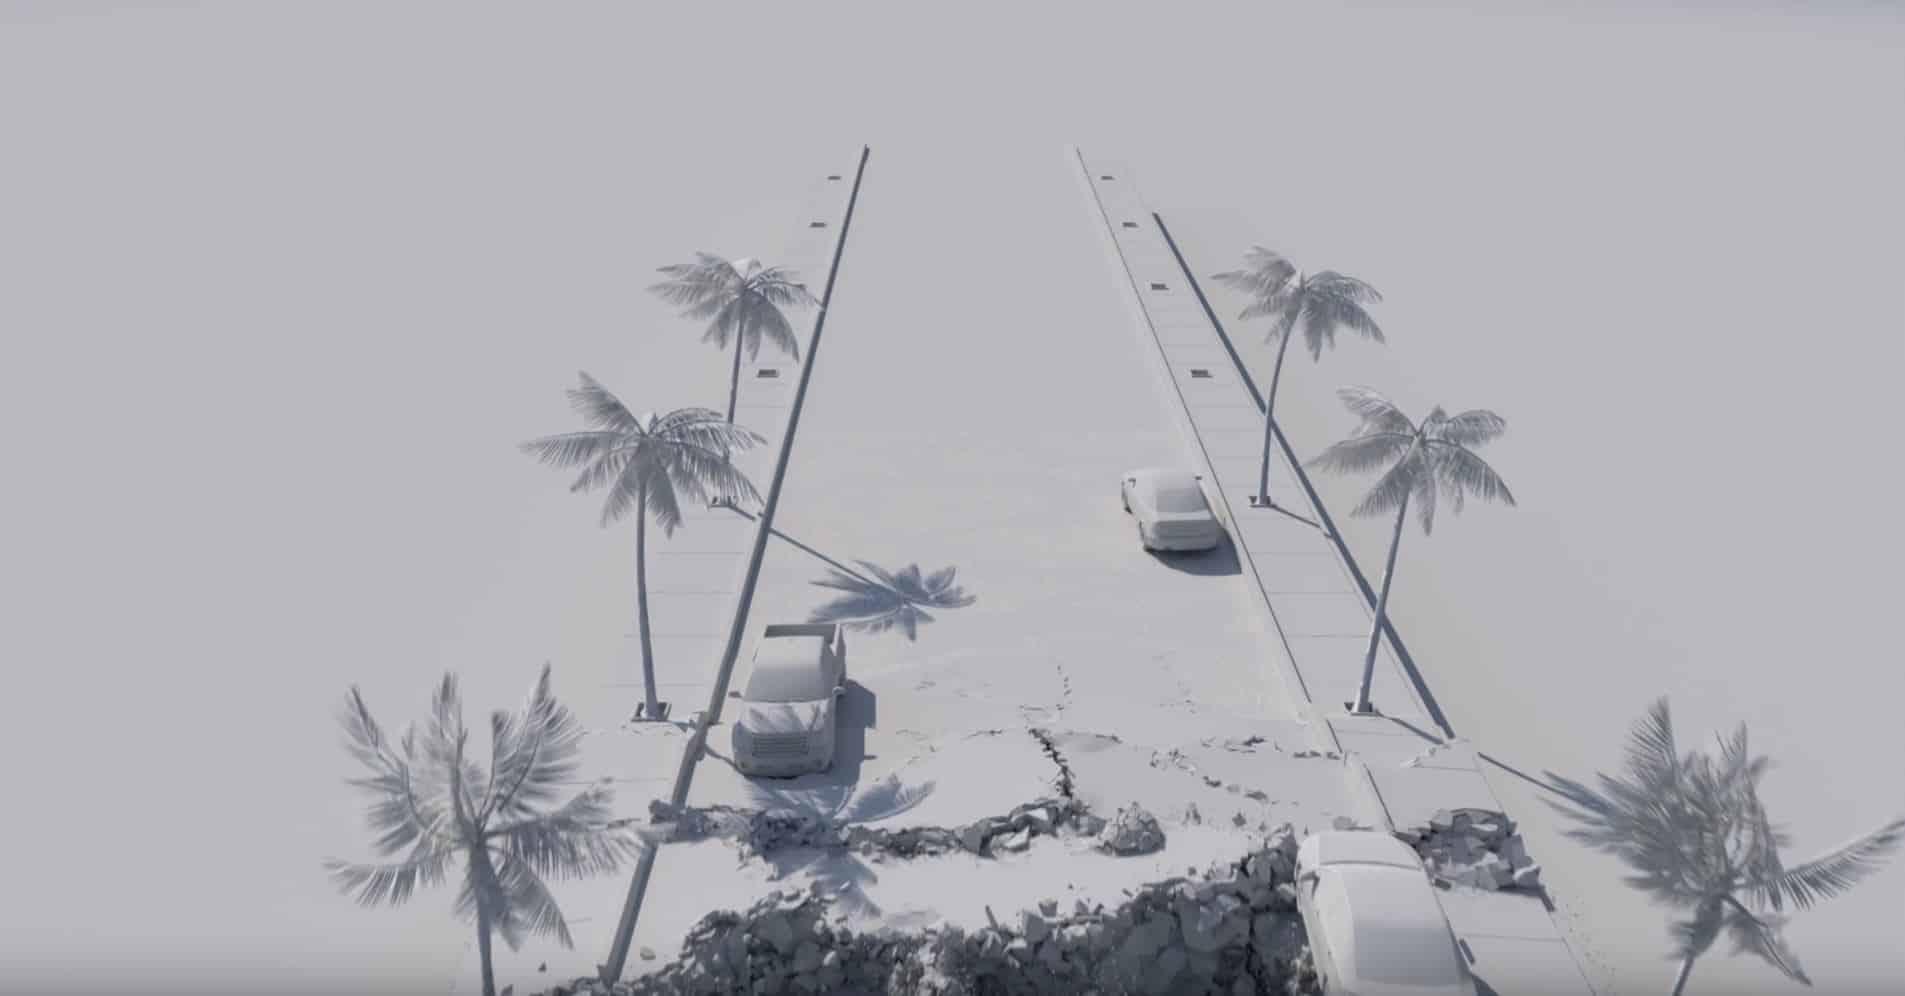 """2012"" Quake FX - 3ds Max Thinking Particles Destruction Scene File"